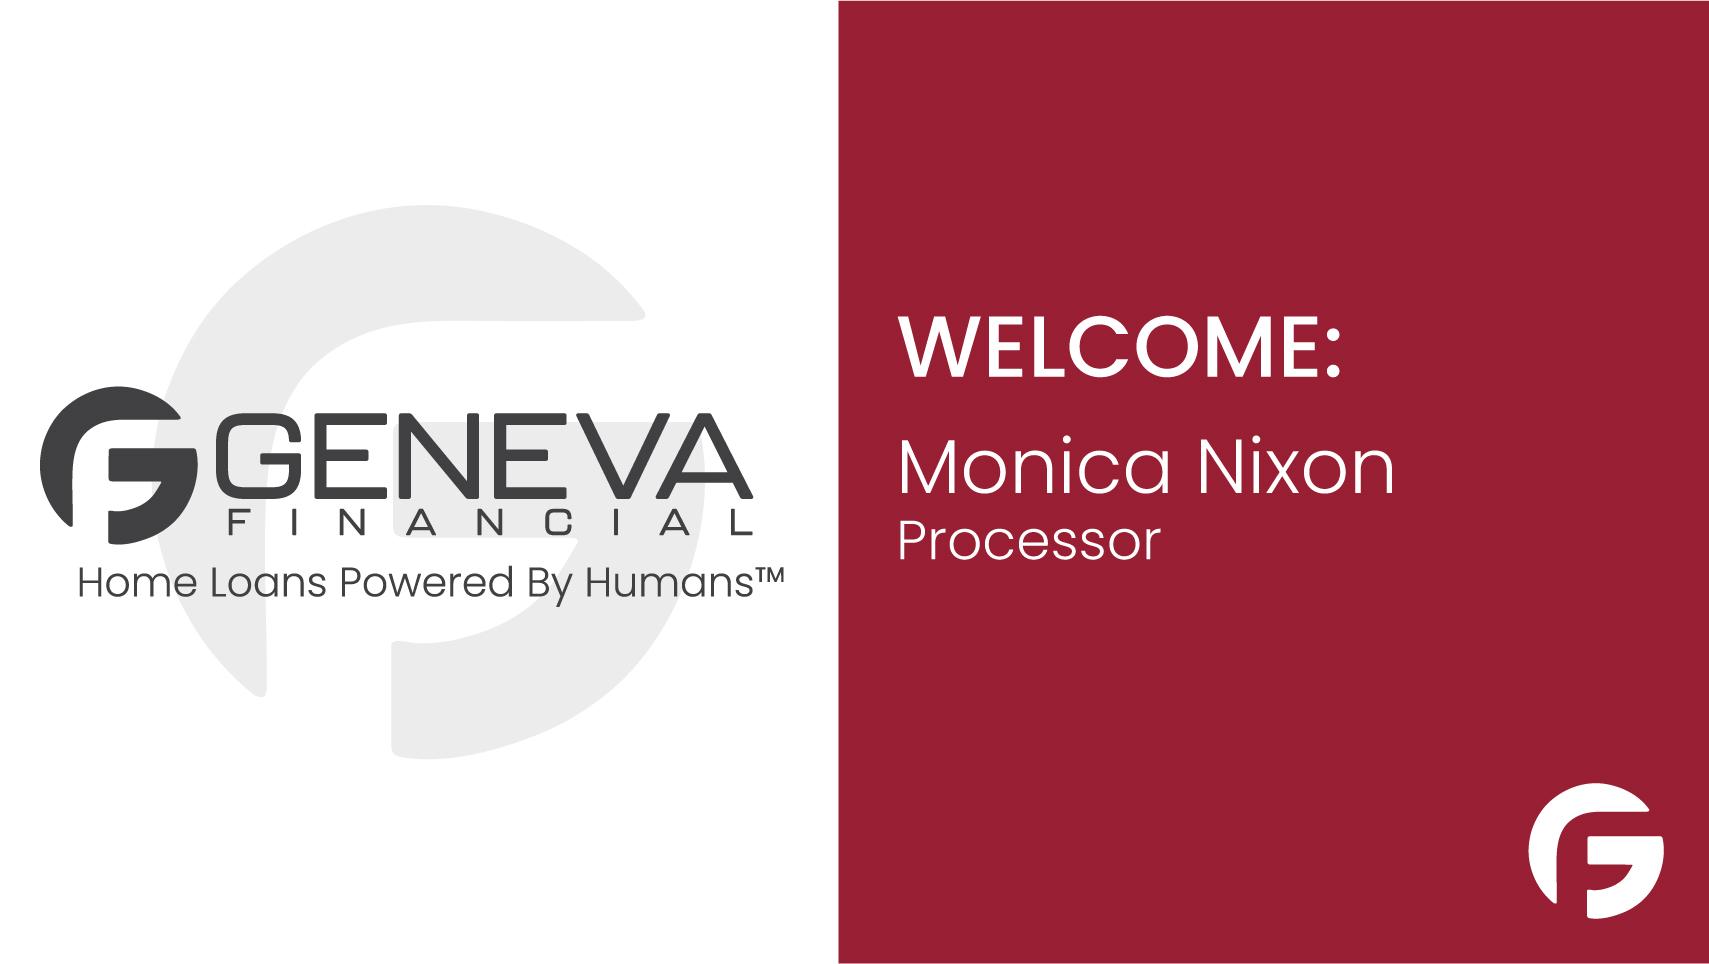 Monica Nixon Loan Processor in San Diego, California